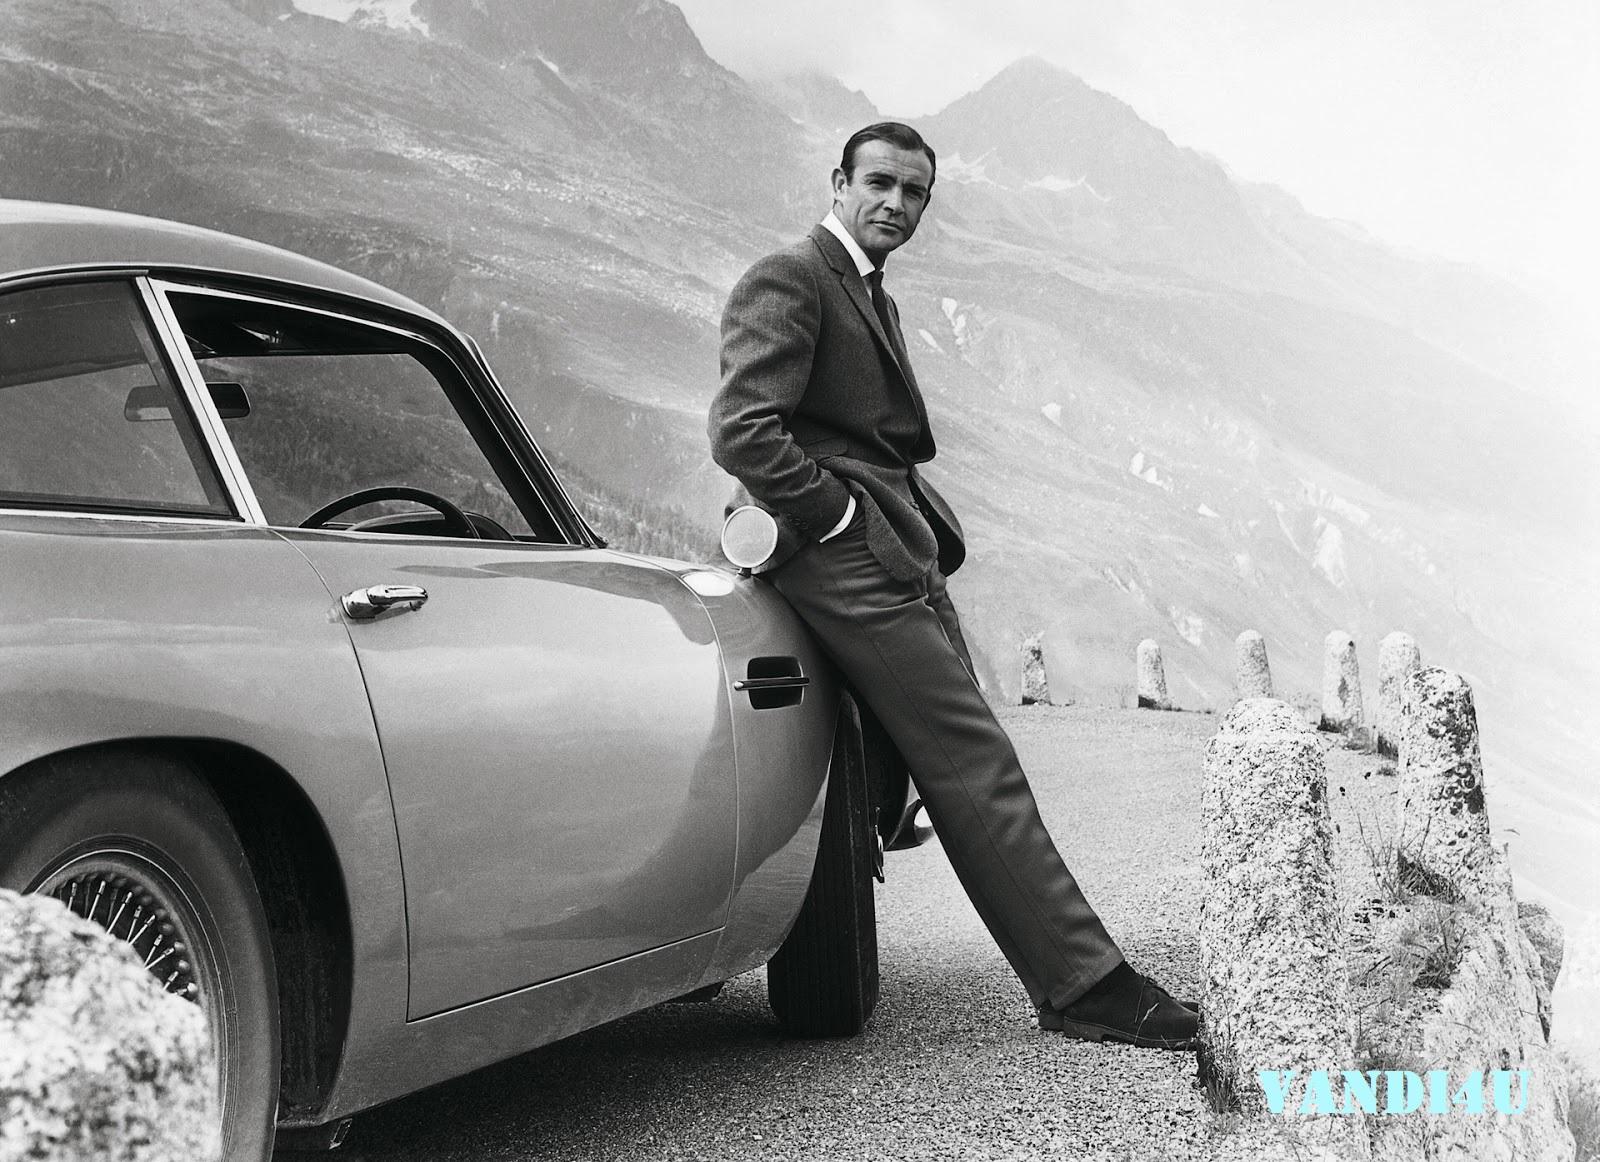 James Bond's 1965 Aston Martin DB-5 Promo Car Sold For Over $6 Million   VANDI4U